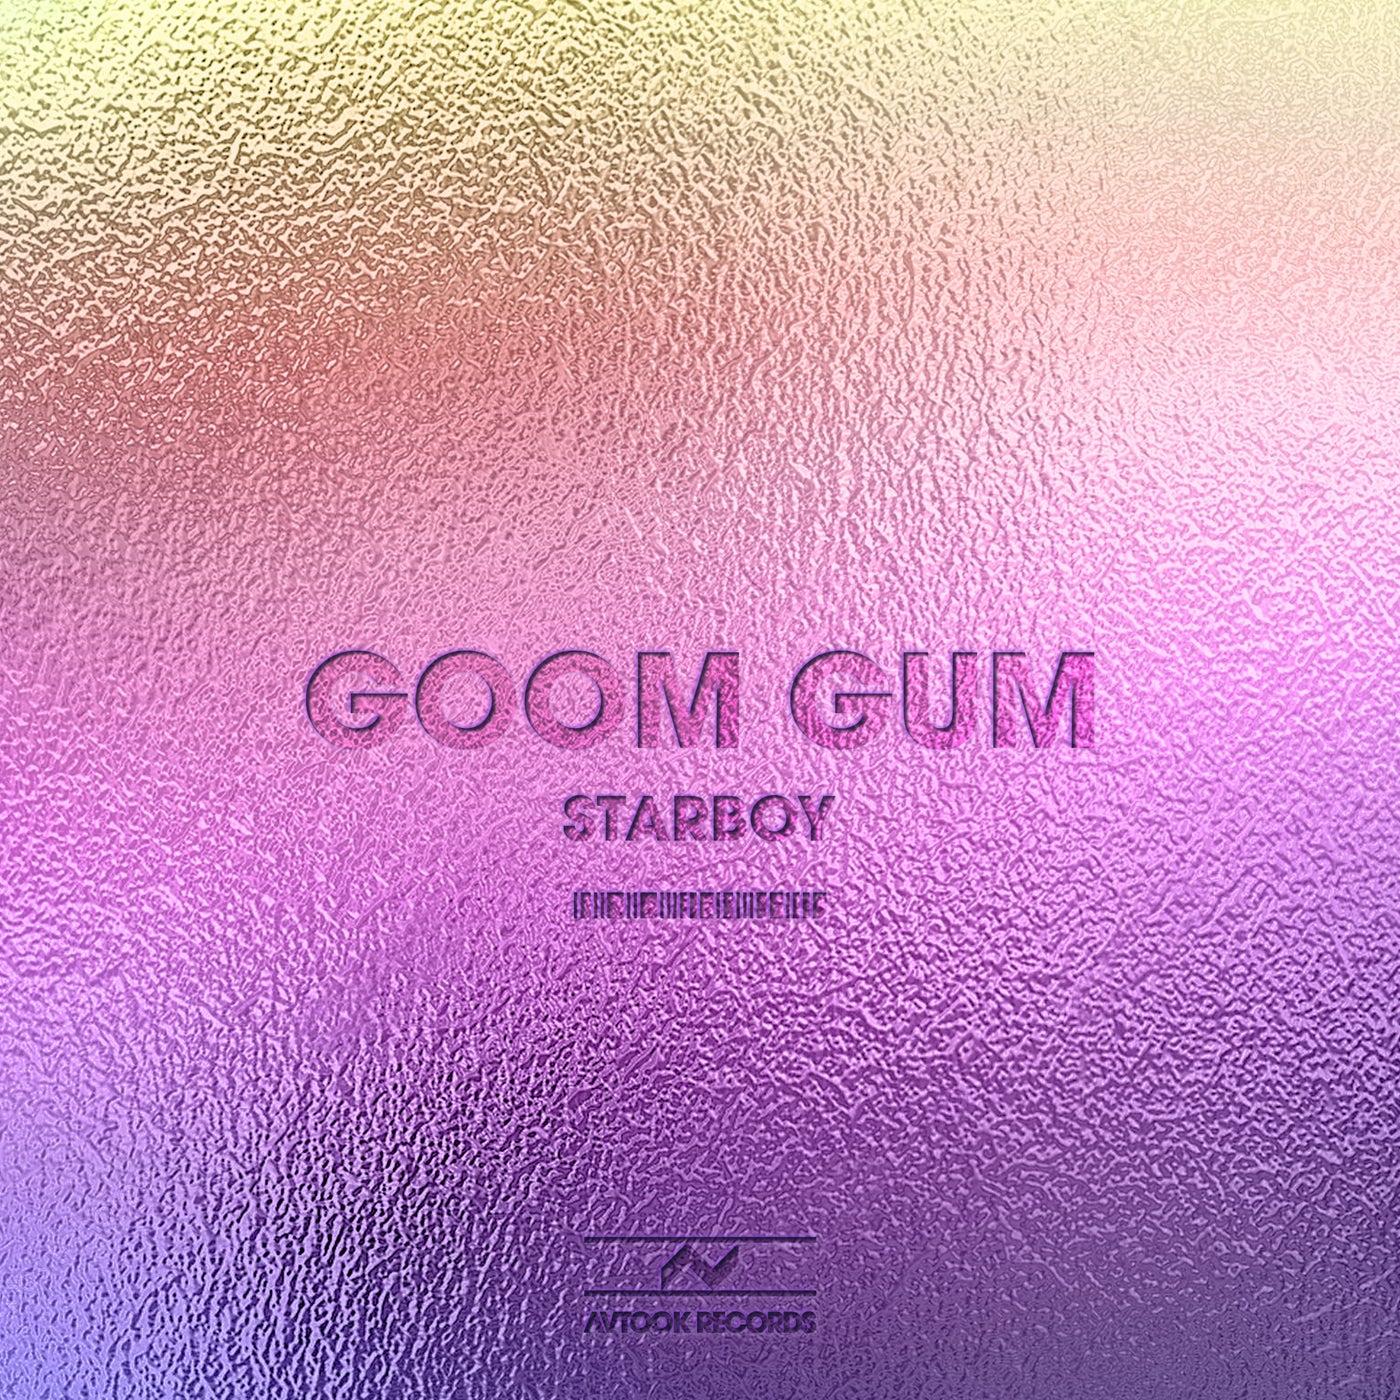 Starboy (Original Mix)